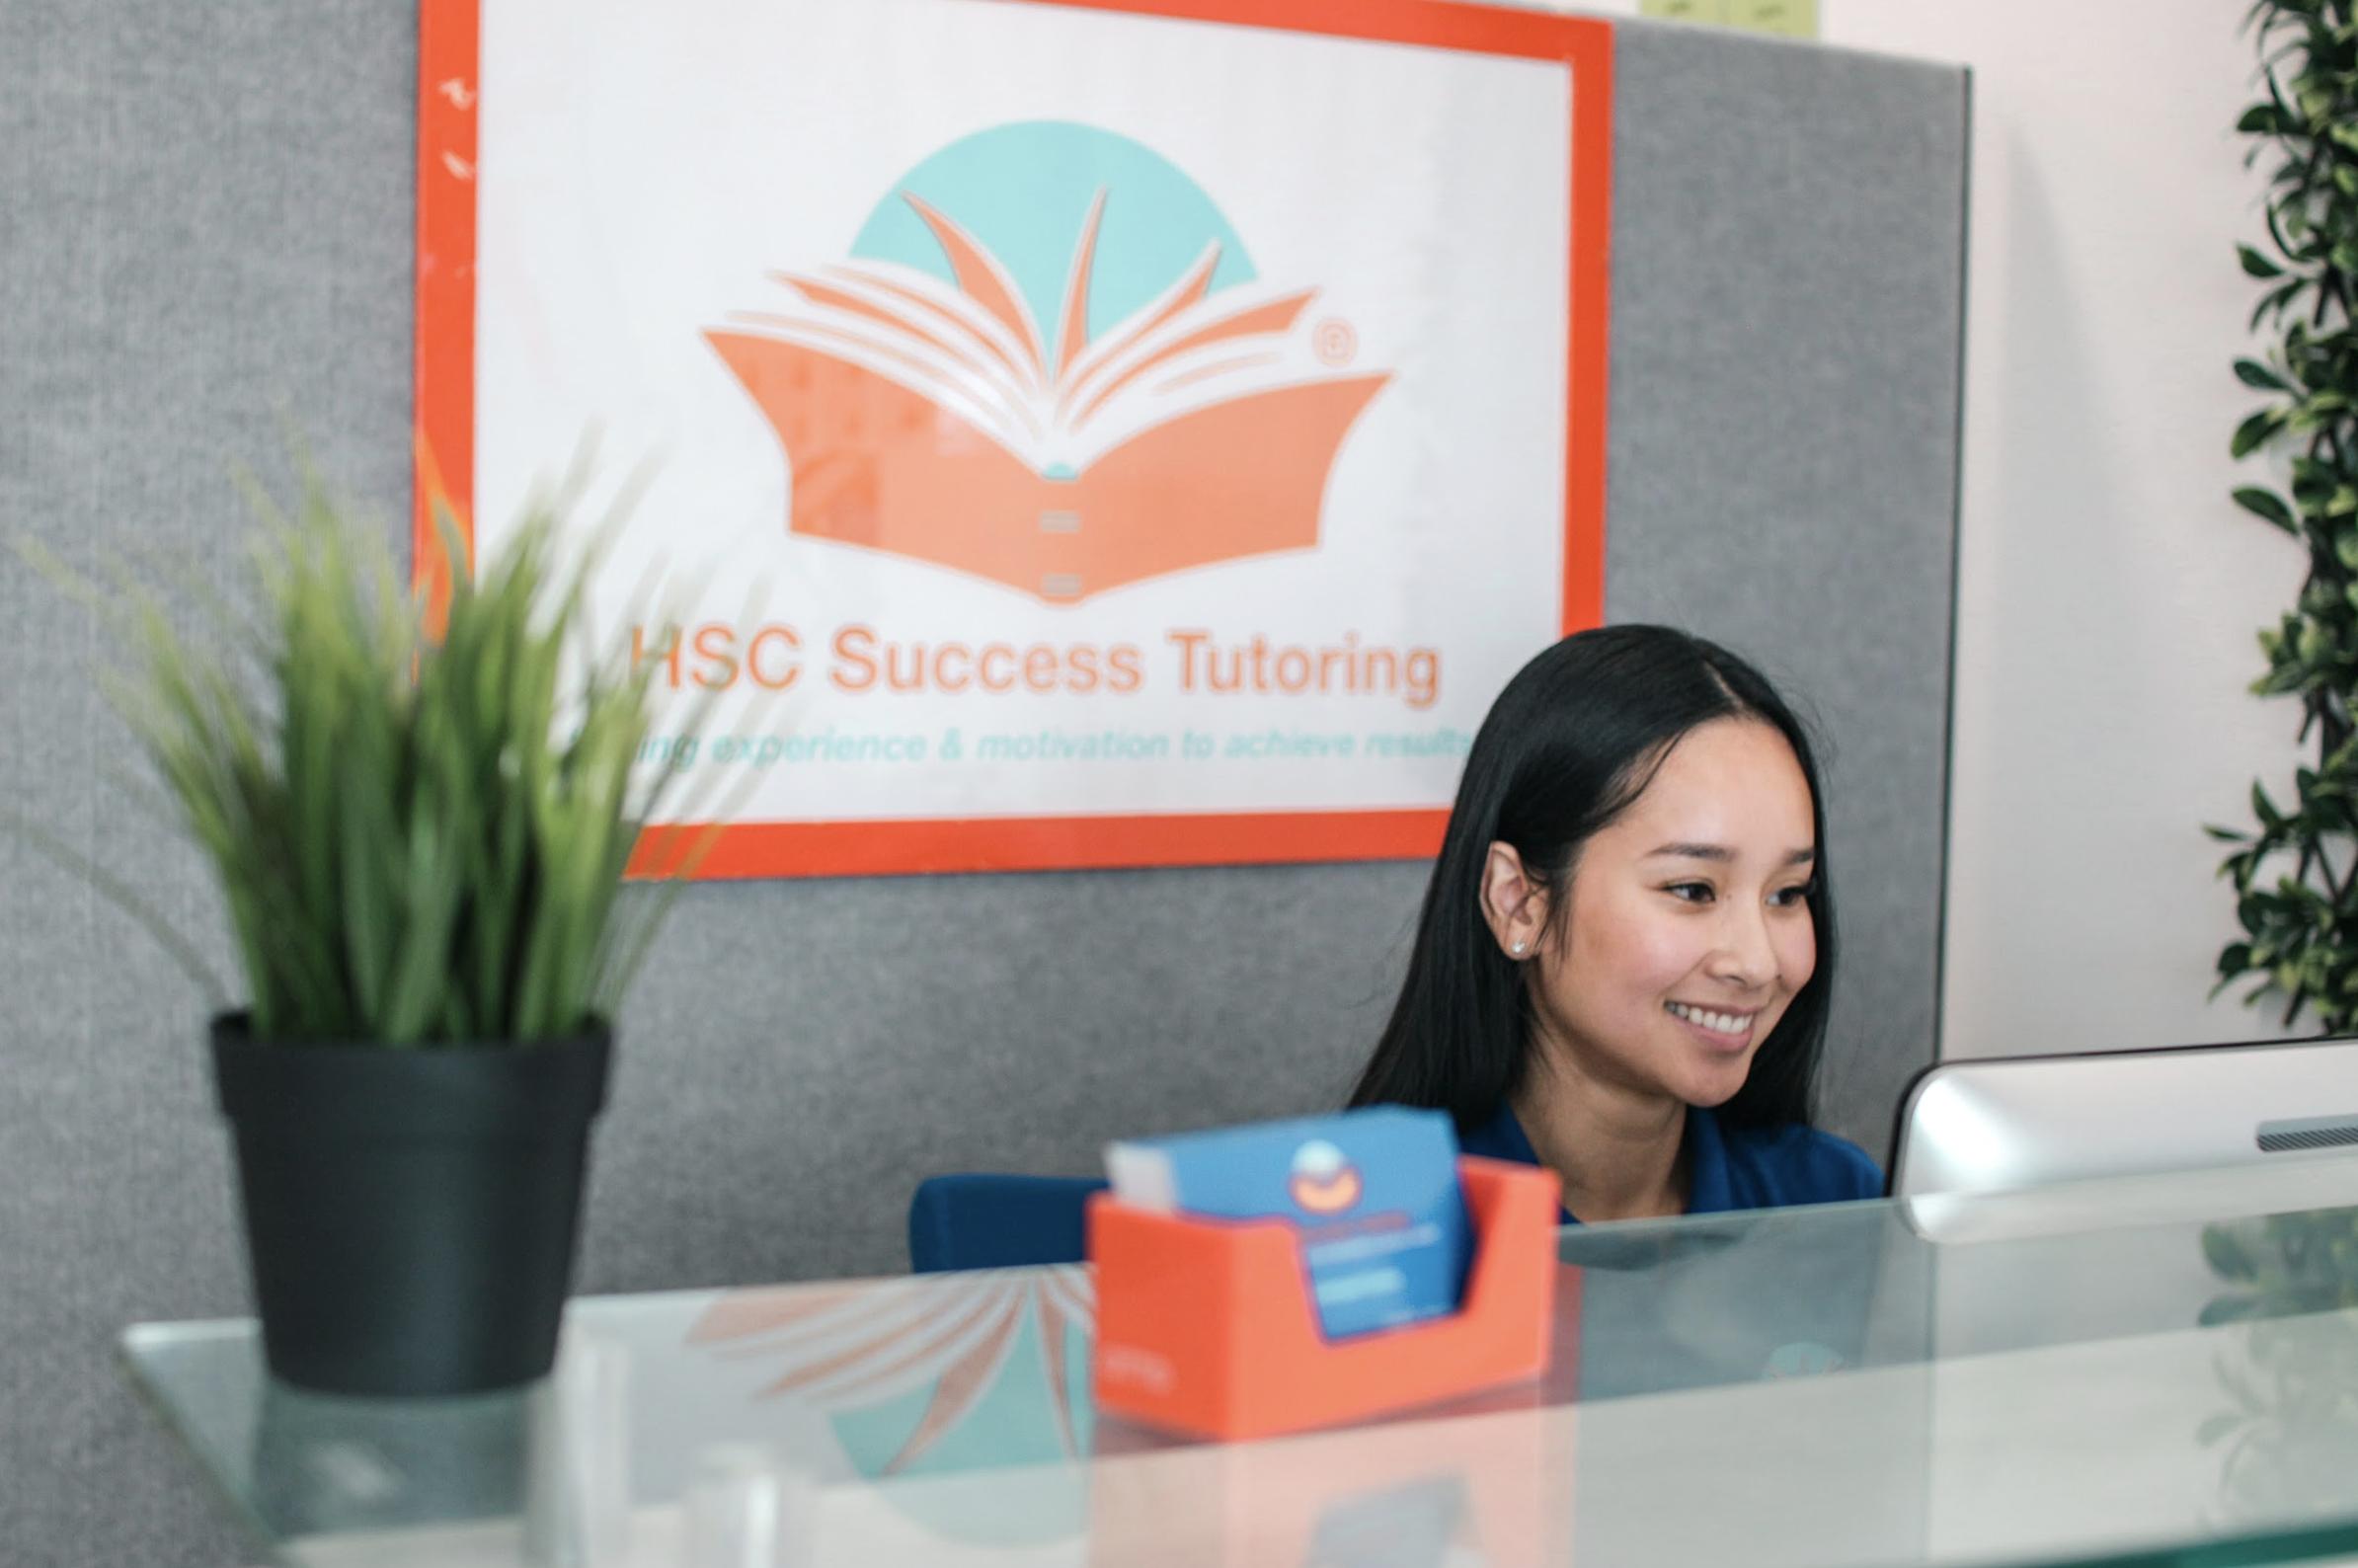 Receptionist | HSC Success Tutoring